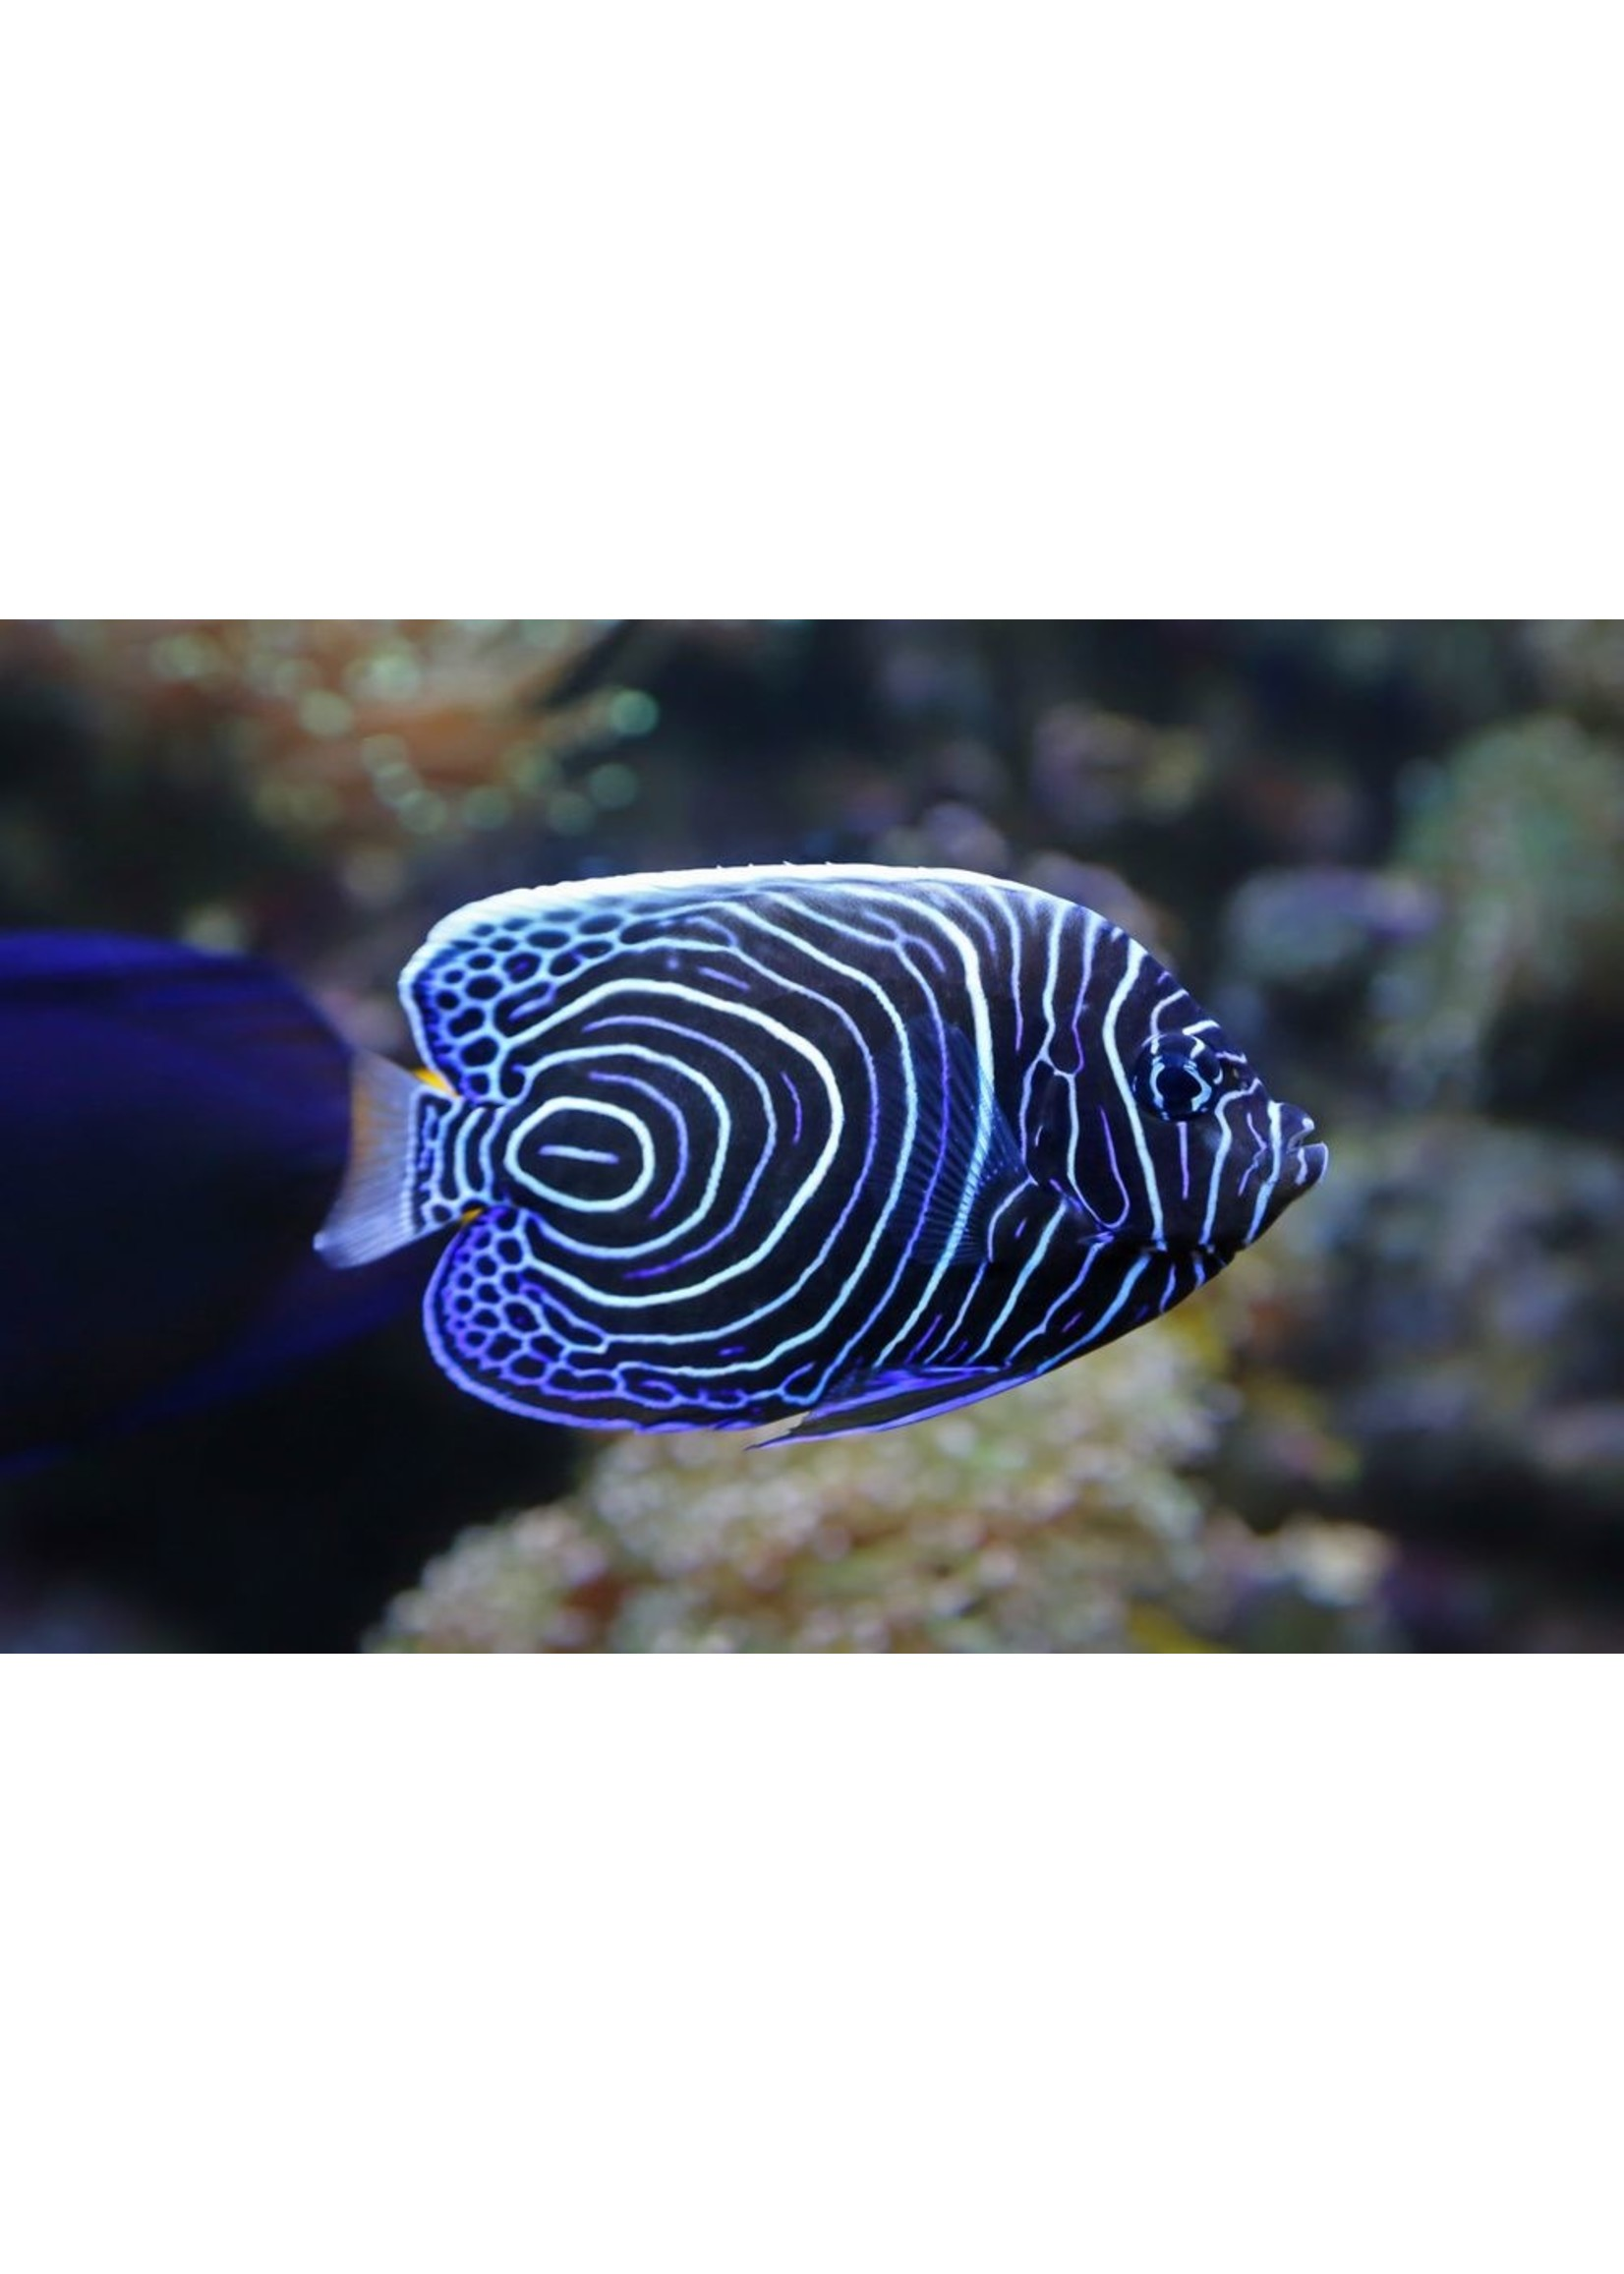 Angelfish Emperor Angelfish (Juv) M